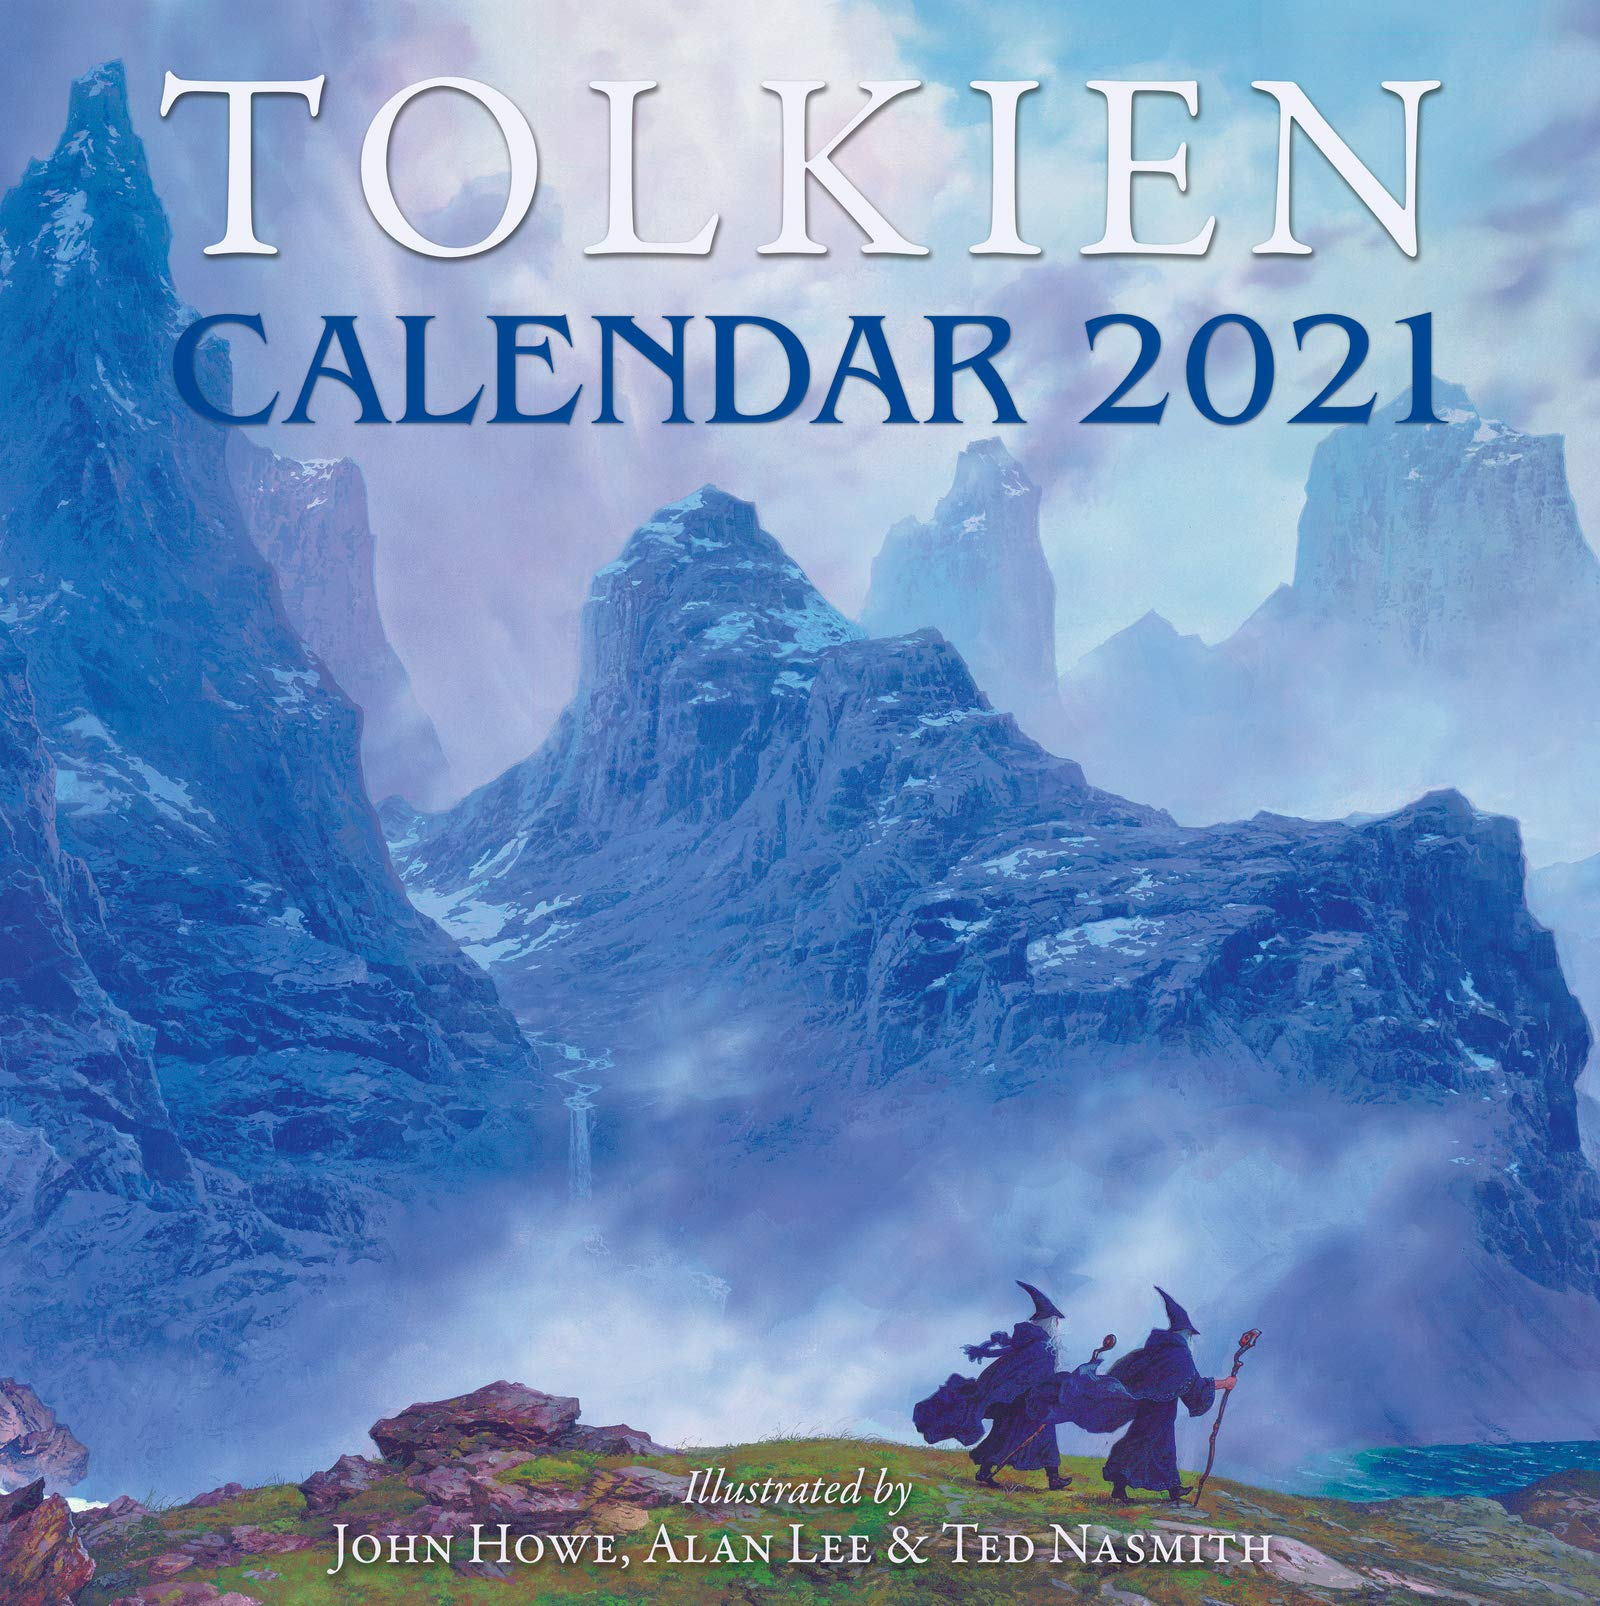 Calendrier Ring 2021 Tolkien Calendar 2021: Tolkien, J. R. R.: 9780063022171: Amazon